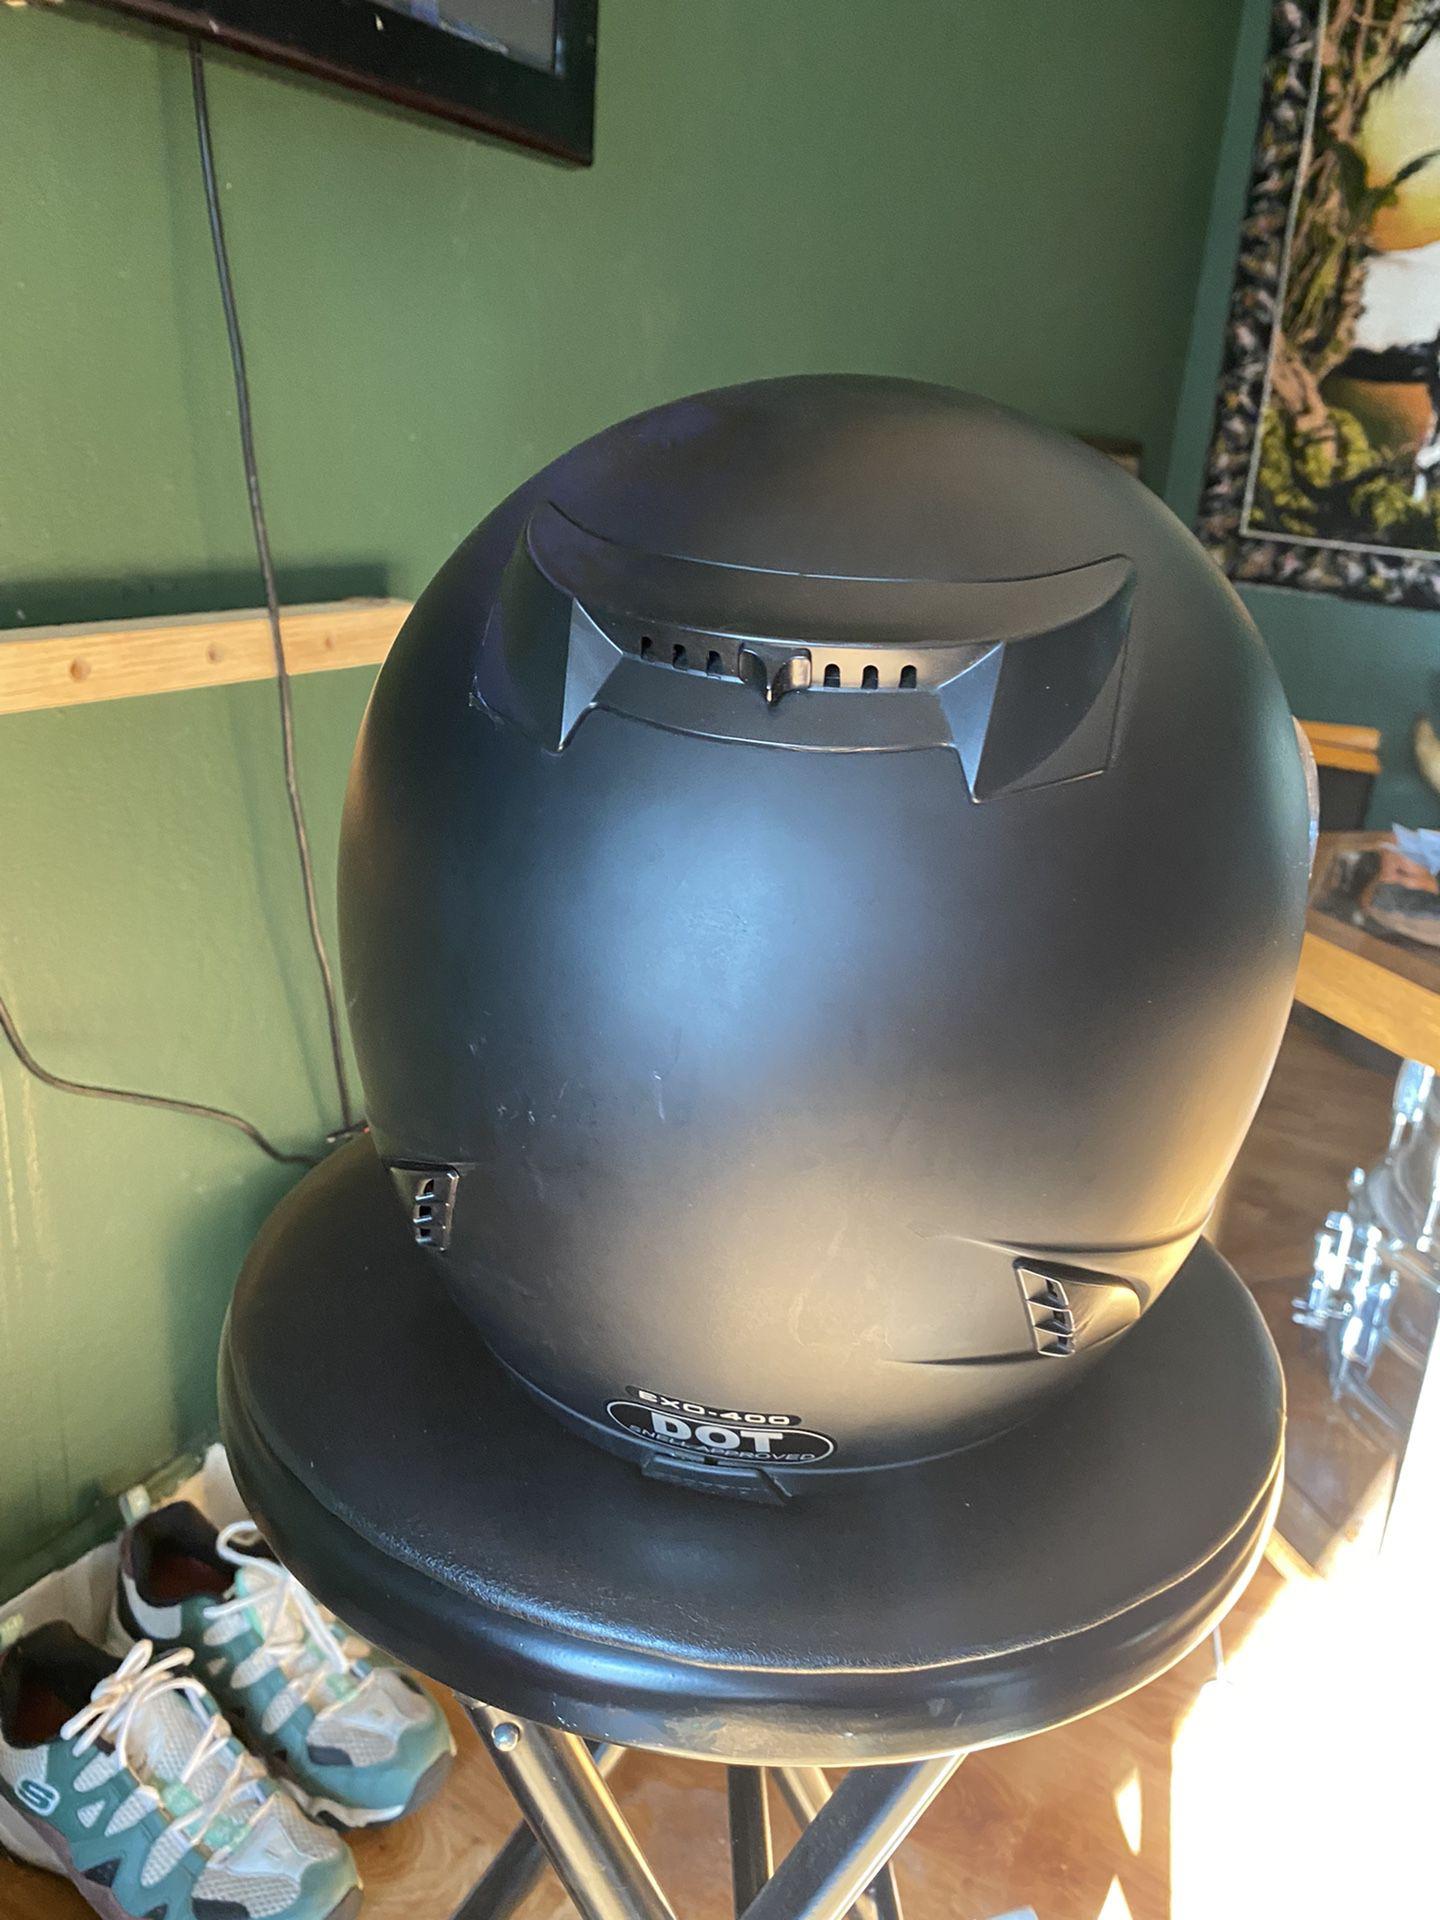 Scorpion Exo-400 Motorcycle Helmet